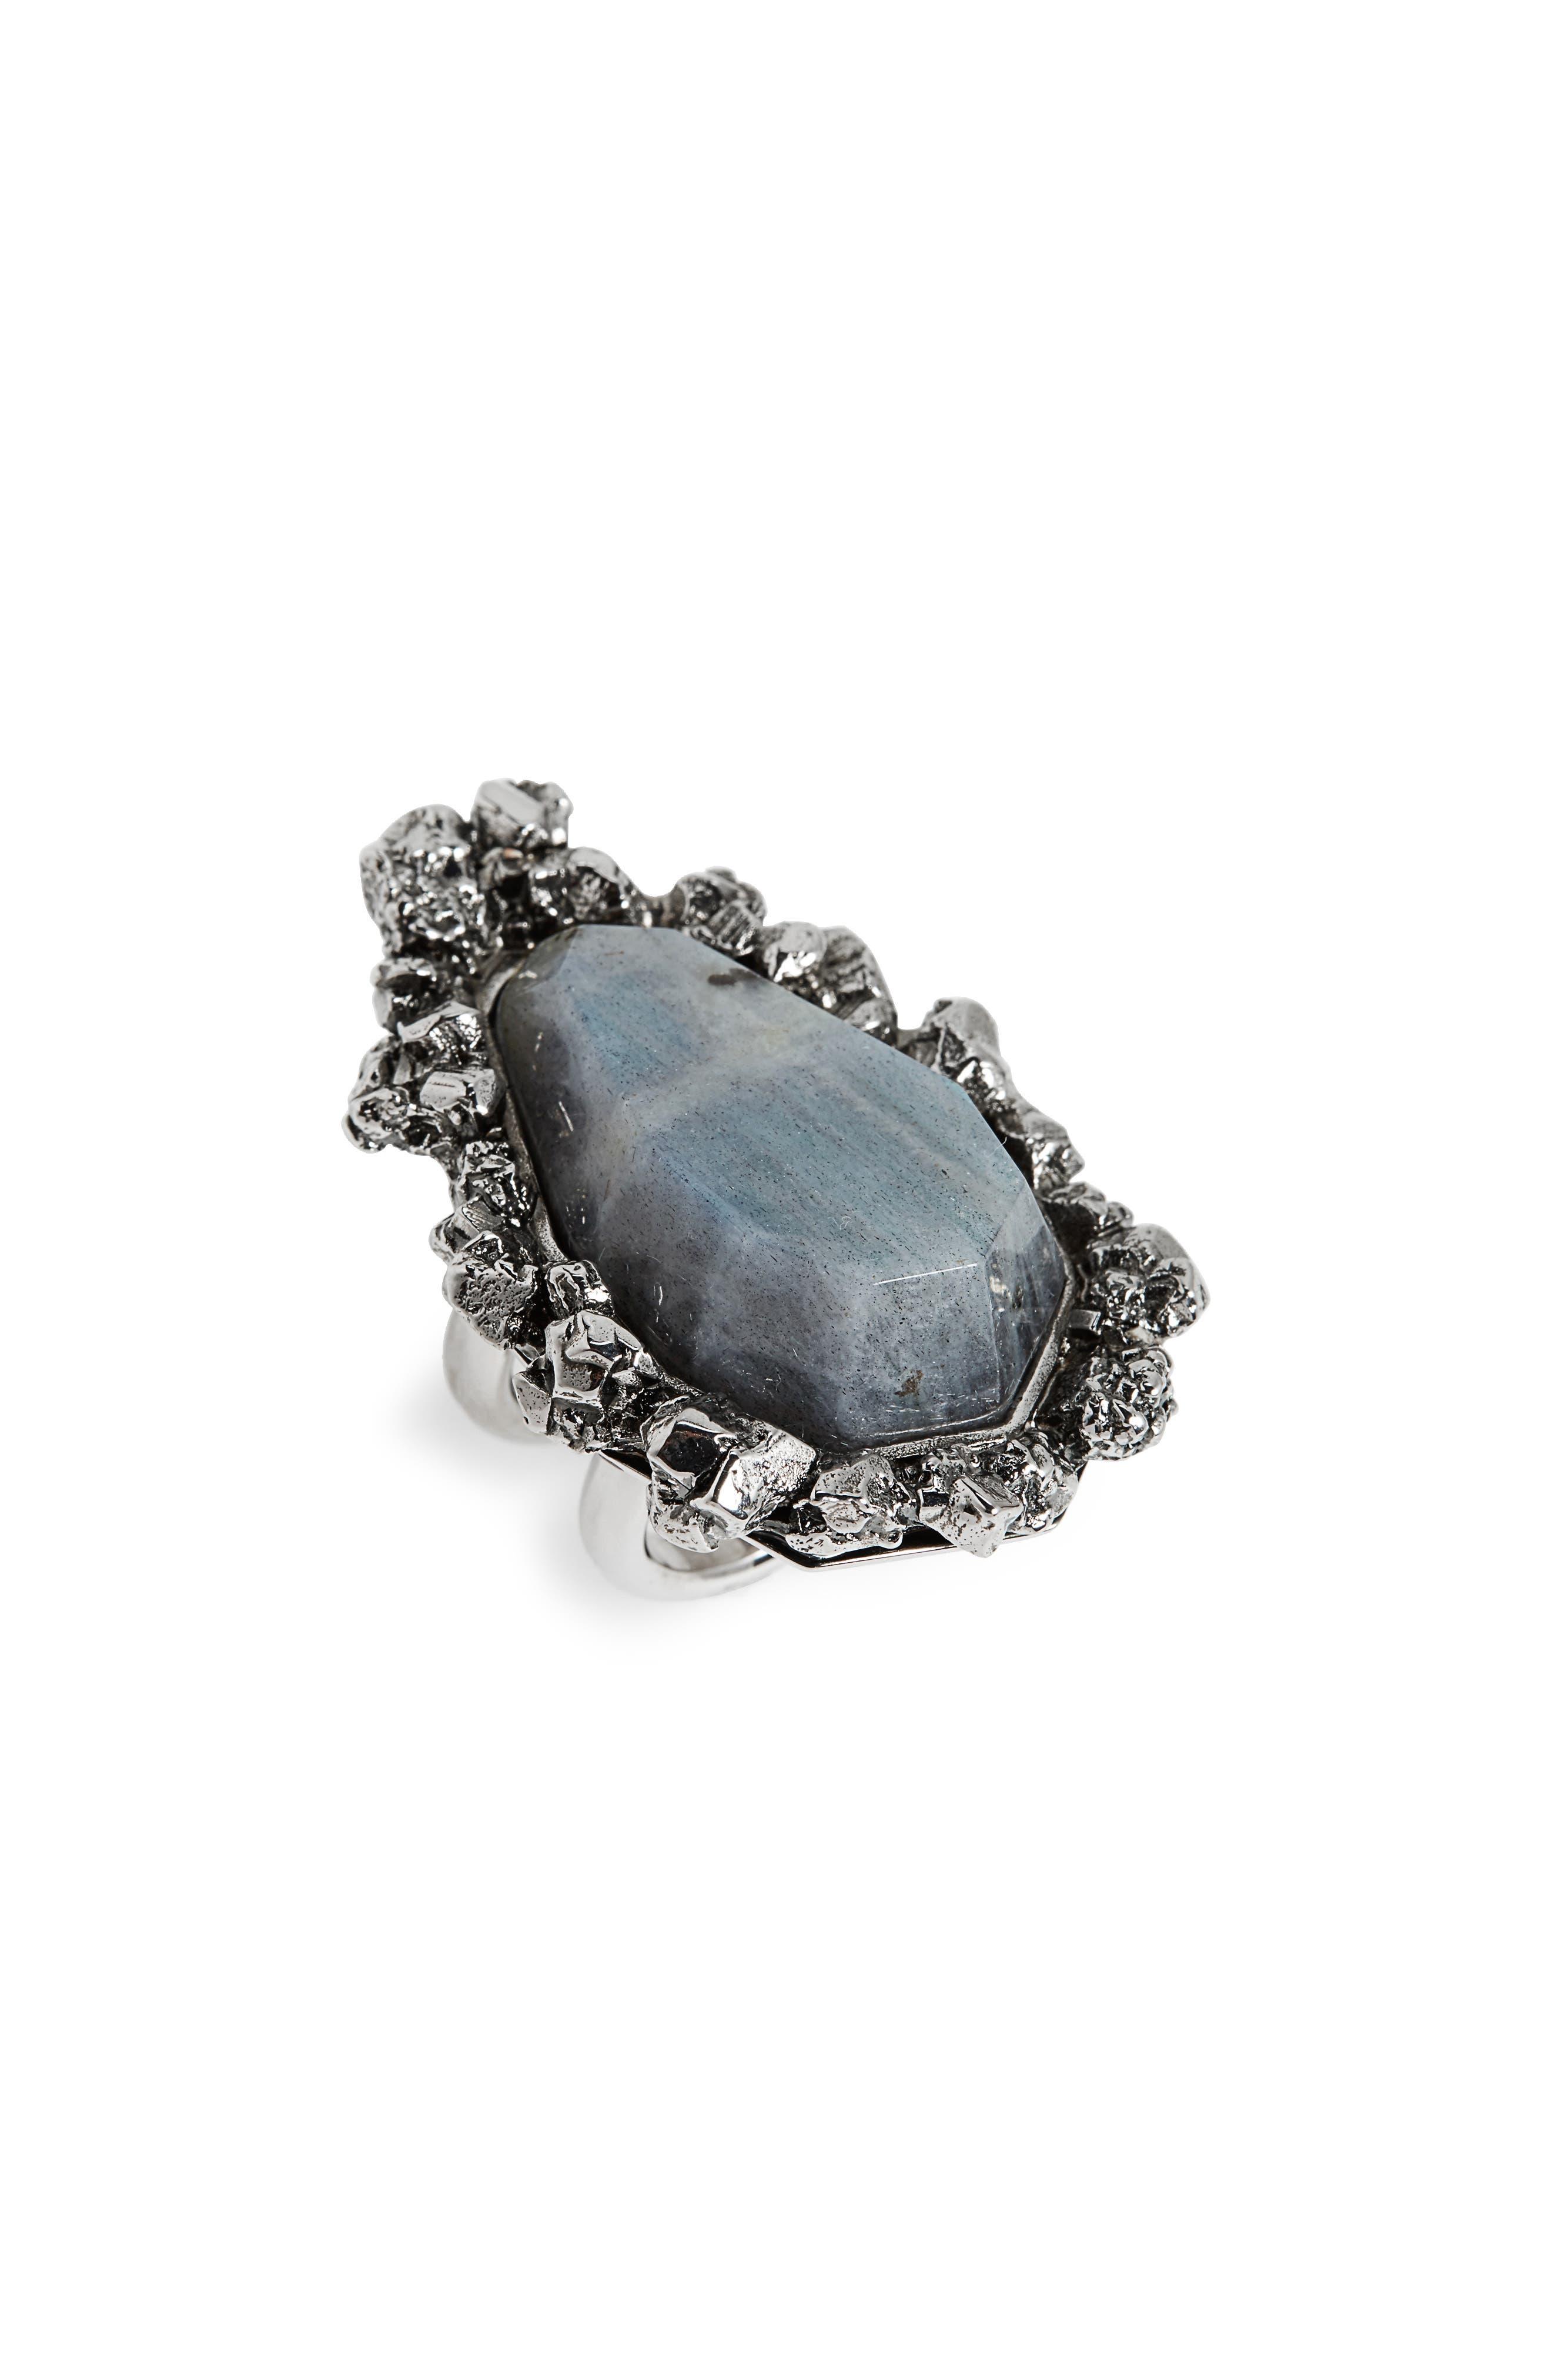 Alternate Image 1 Selected - Alexander McQueen Labradorite Ring